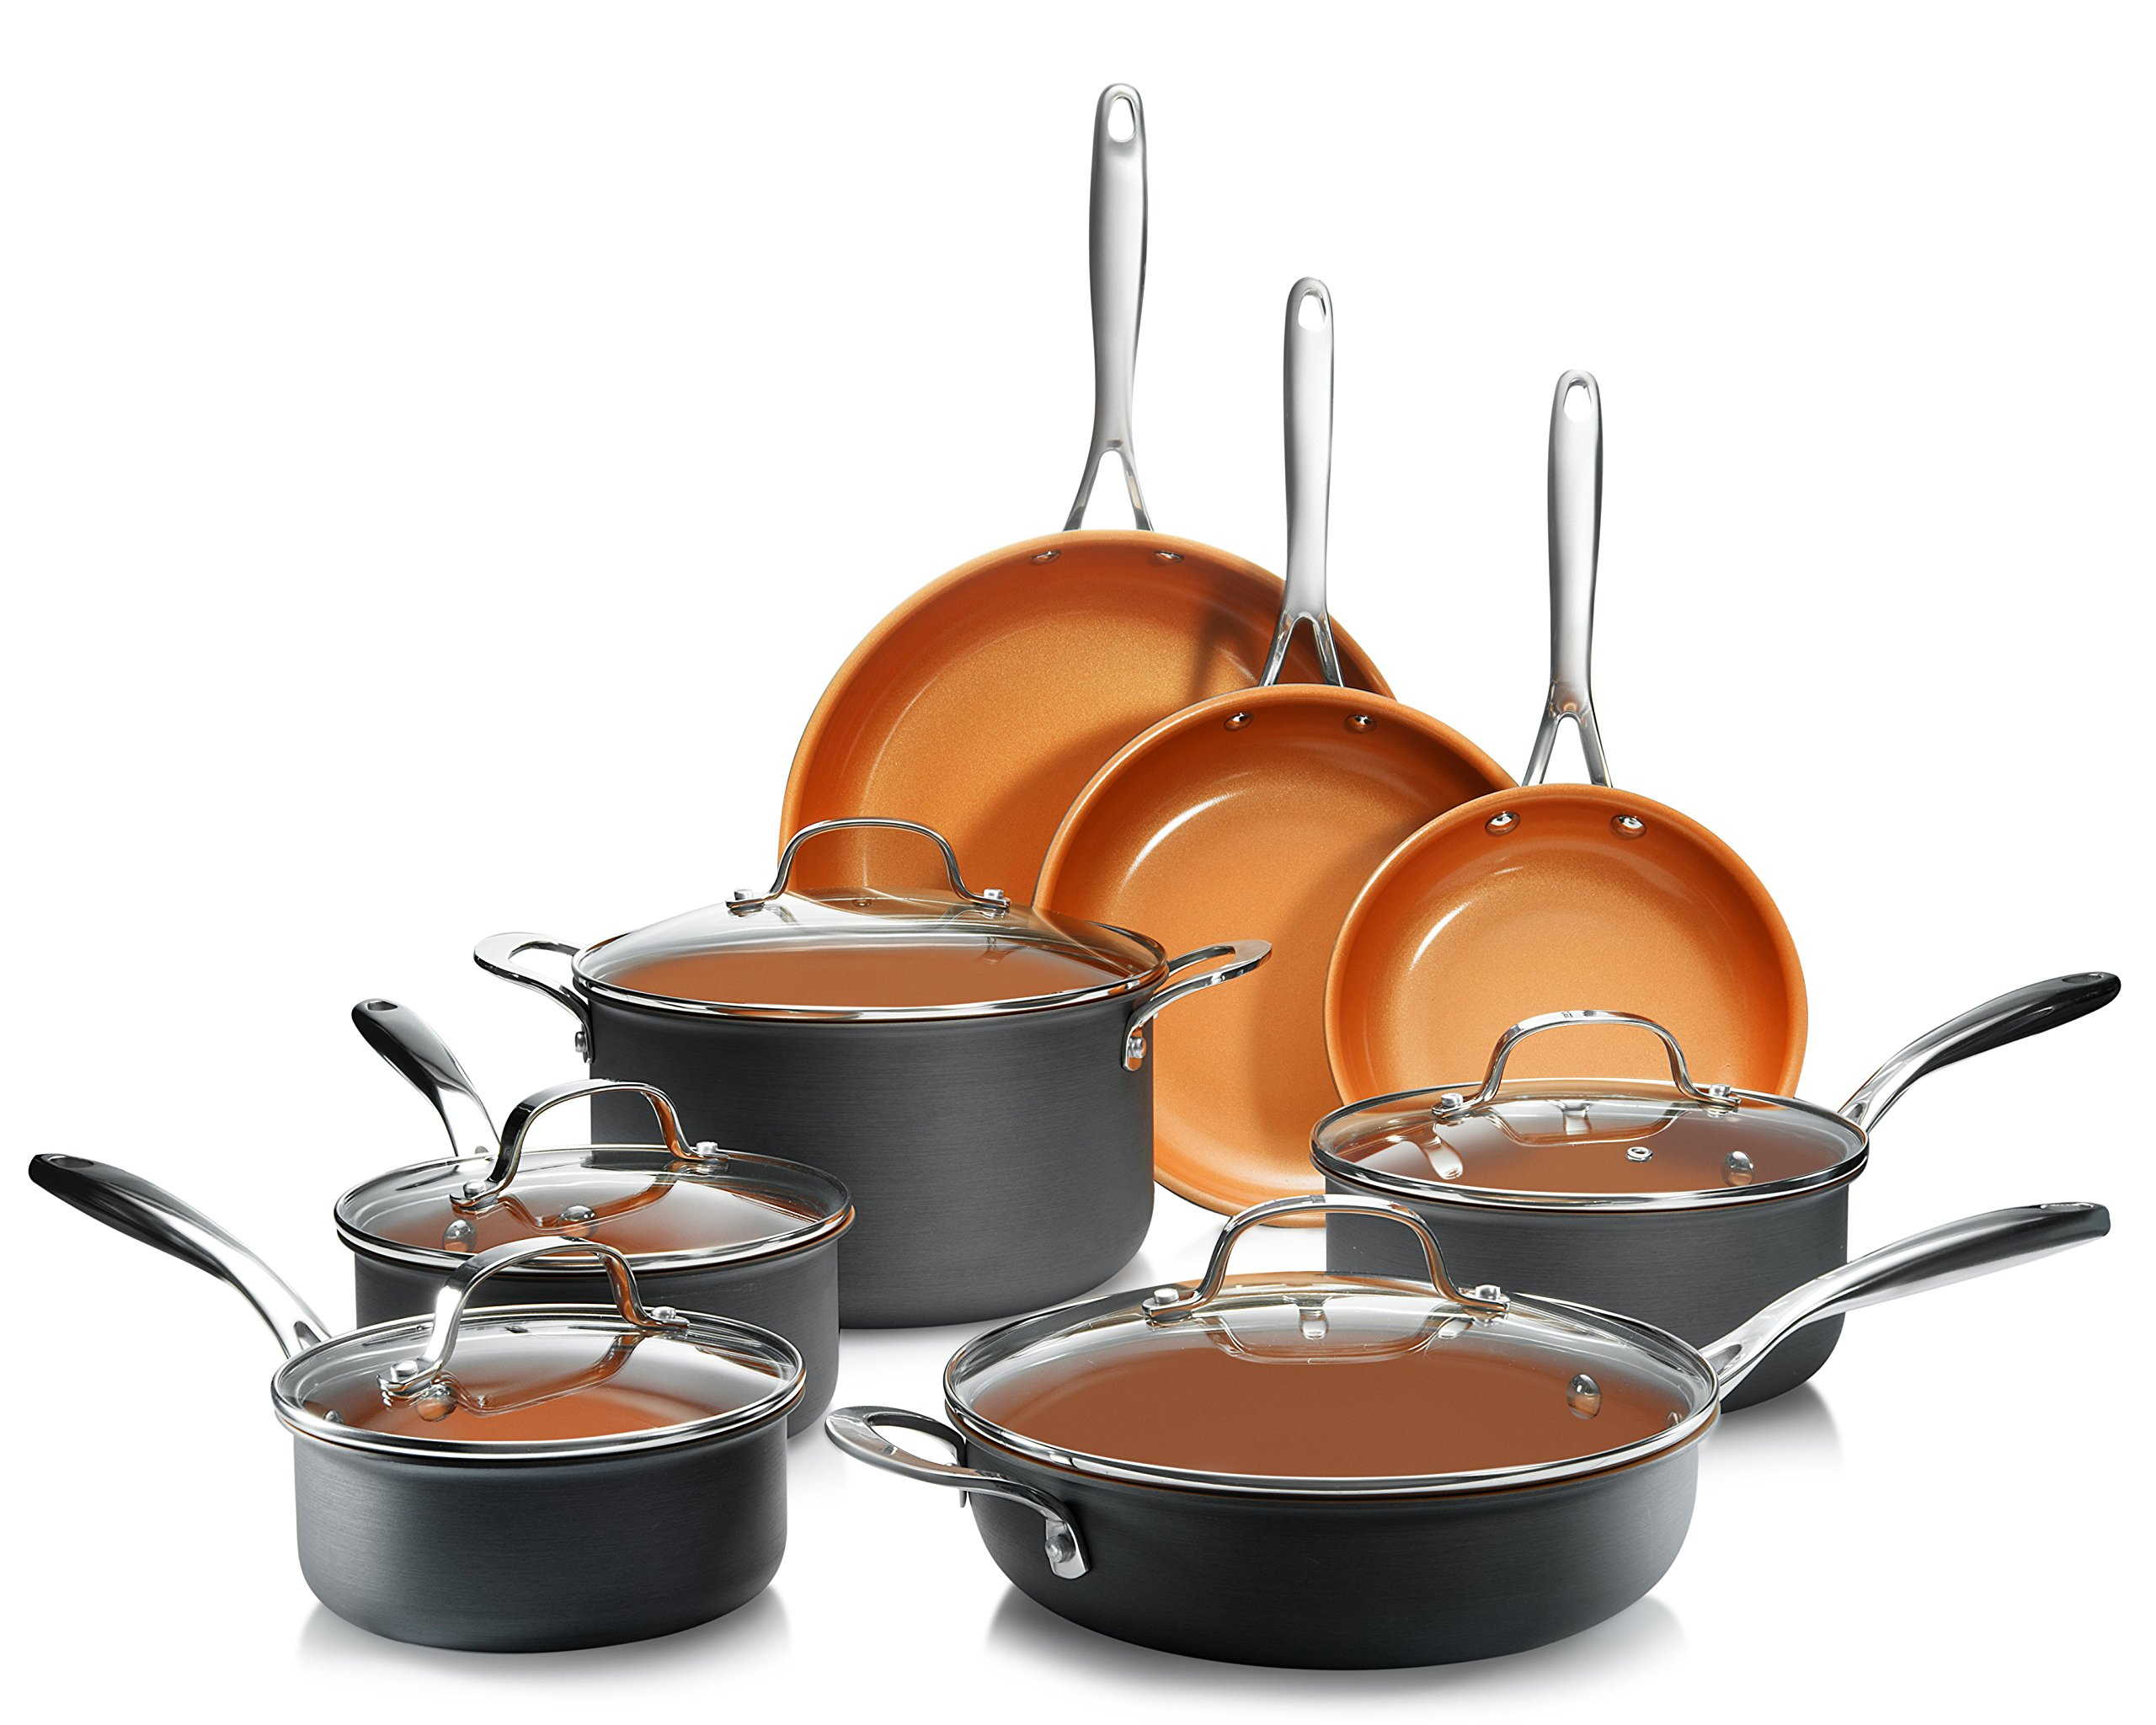 Anodized Cookware Nonstick Ti Cerama Coating